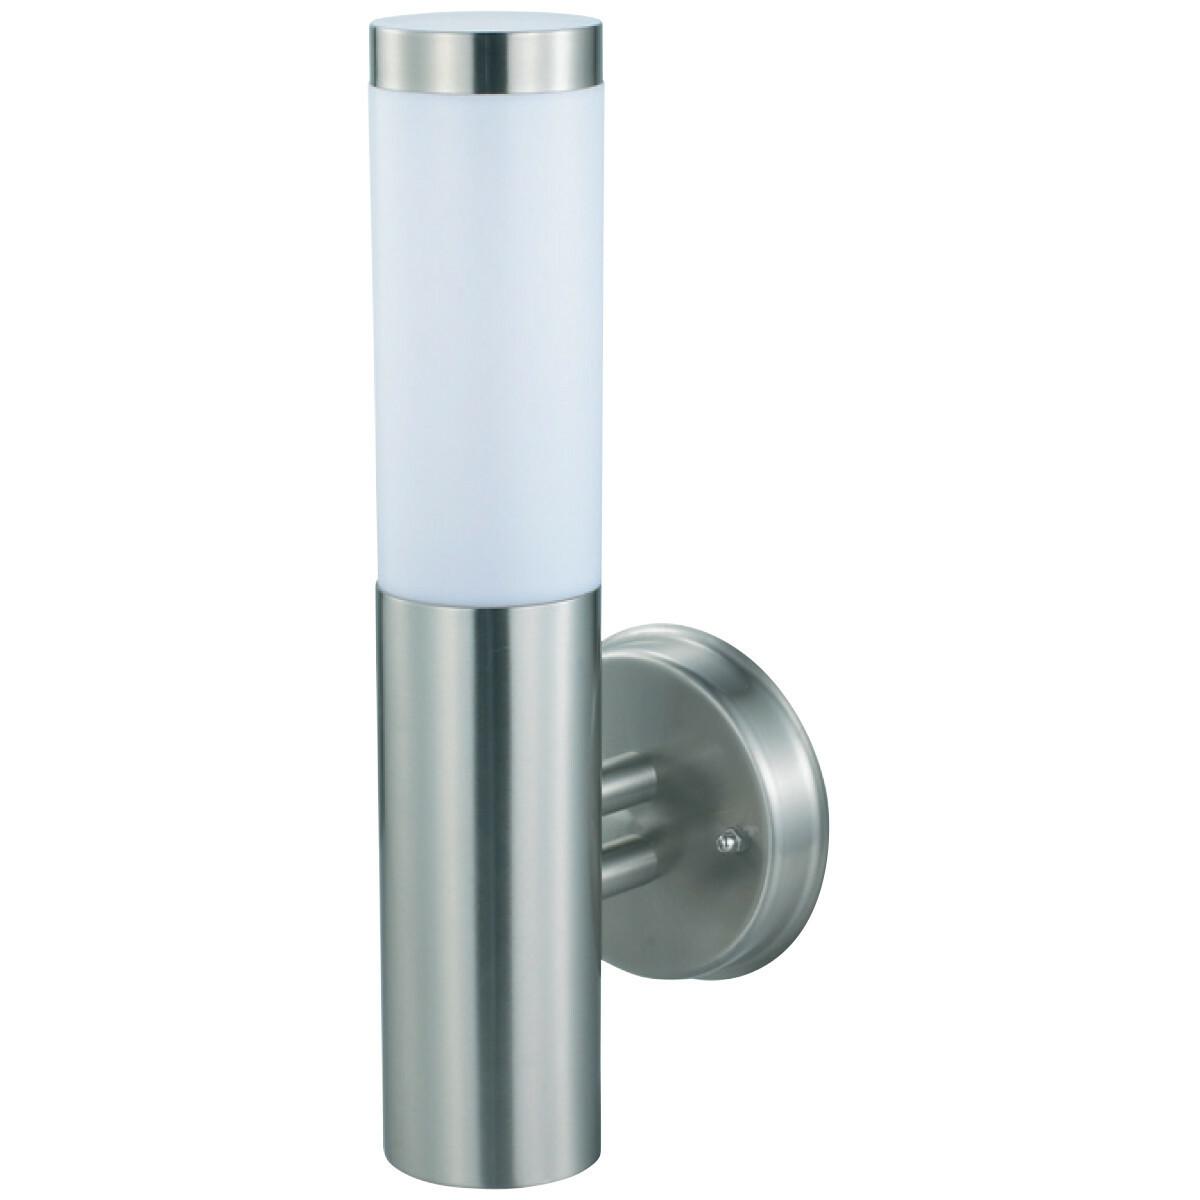 PHILIPS - LED Tuinverlichting - Wandlamp Buiten - SceneSwitch 827 A60 - Laurea 2 - E27 Fitting - Dim